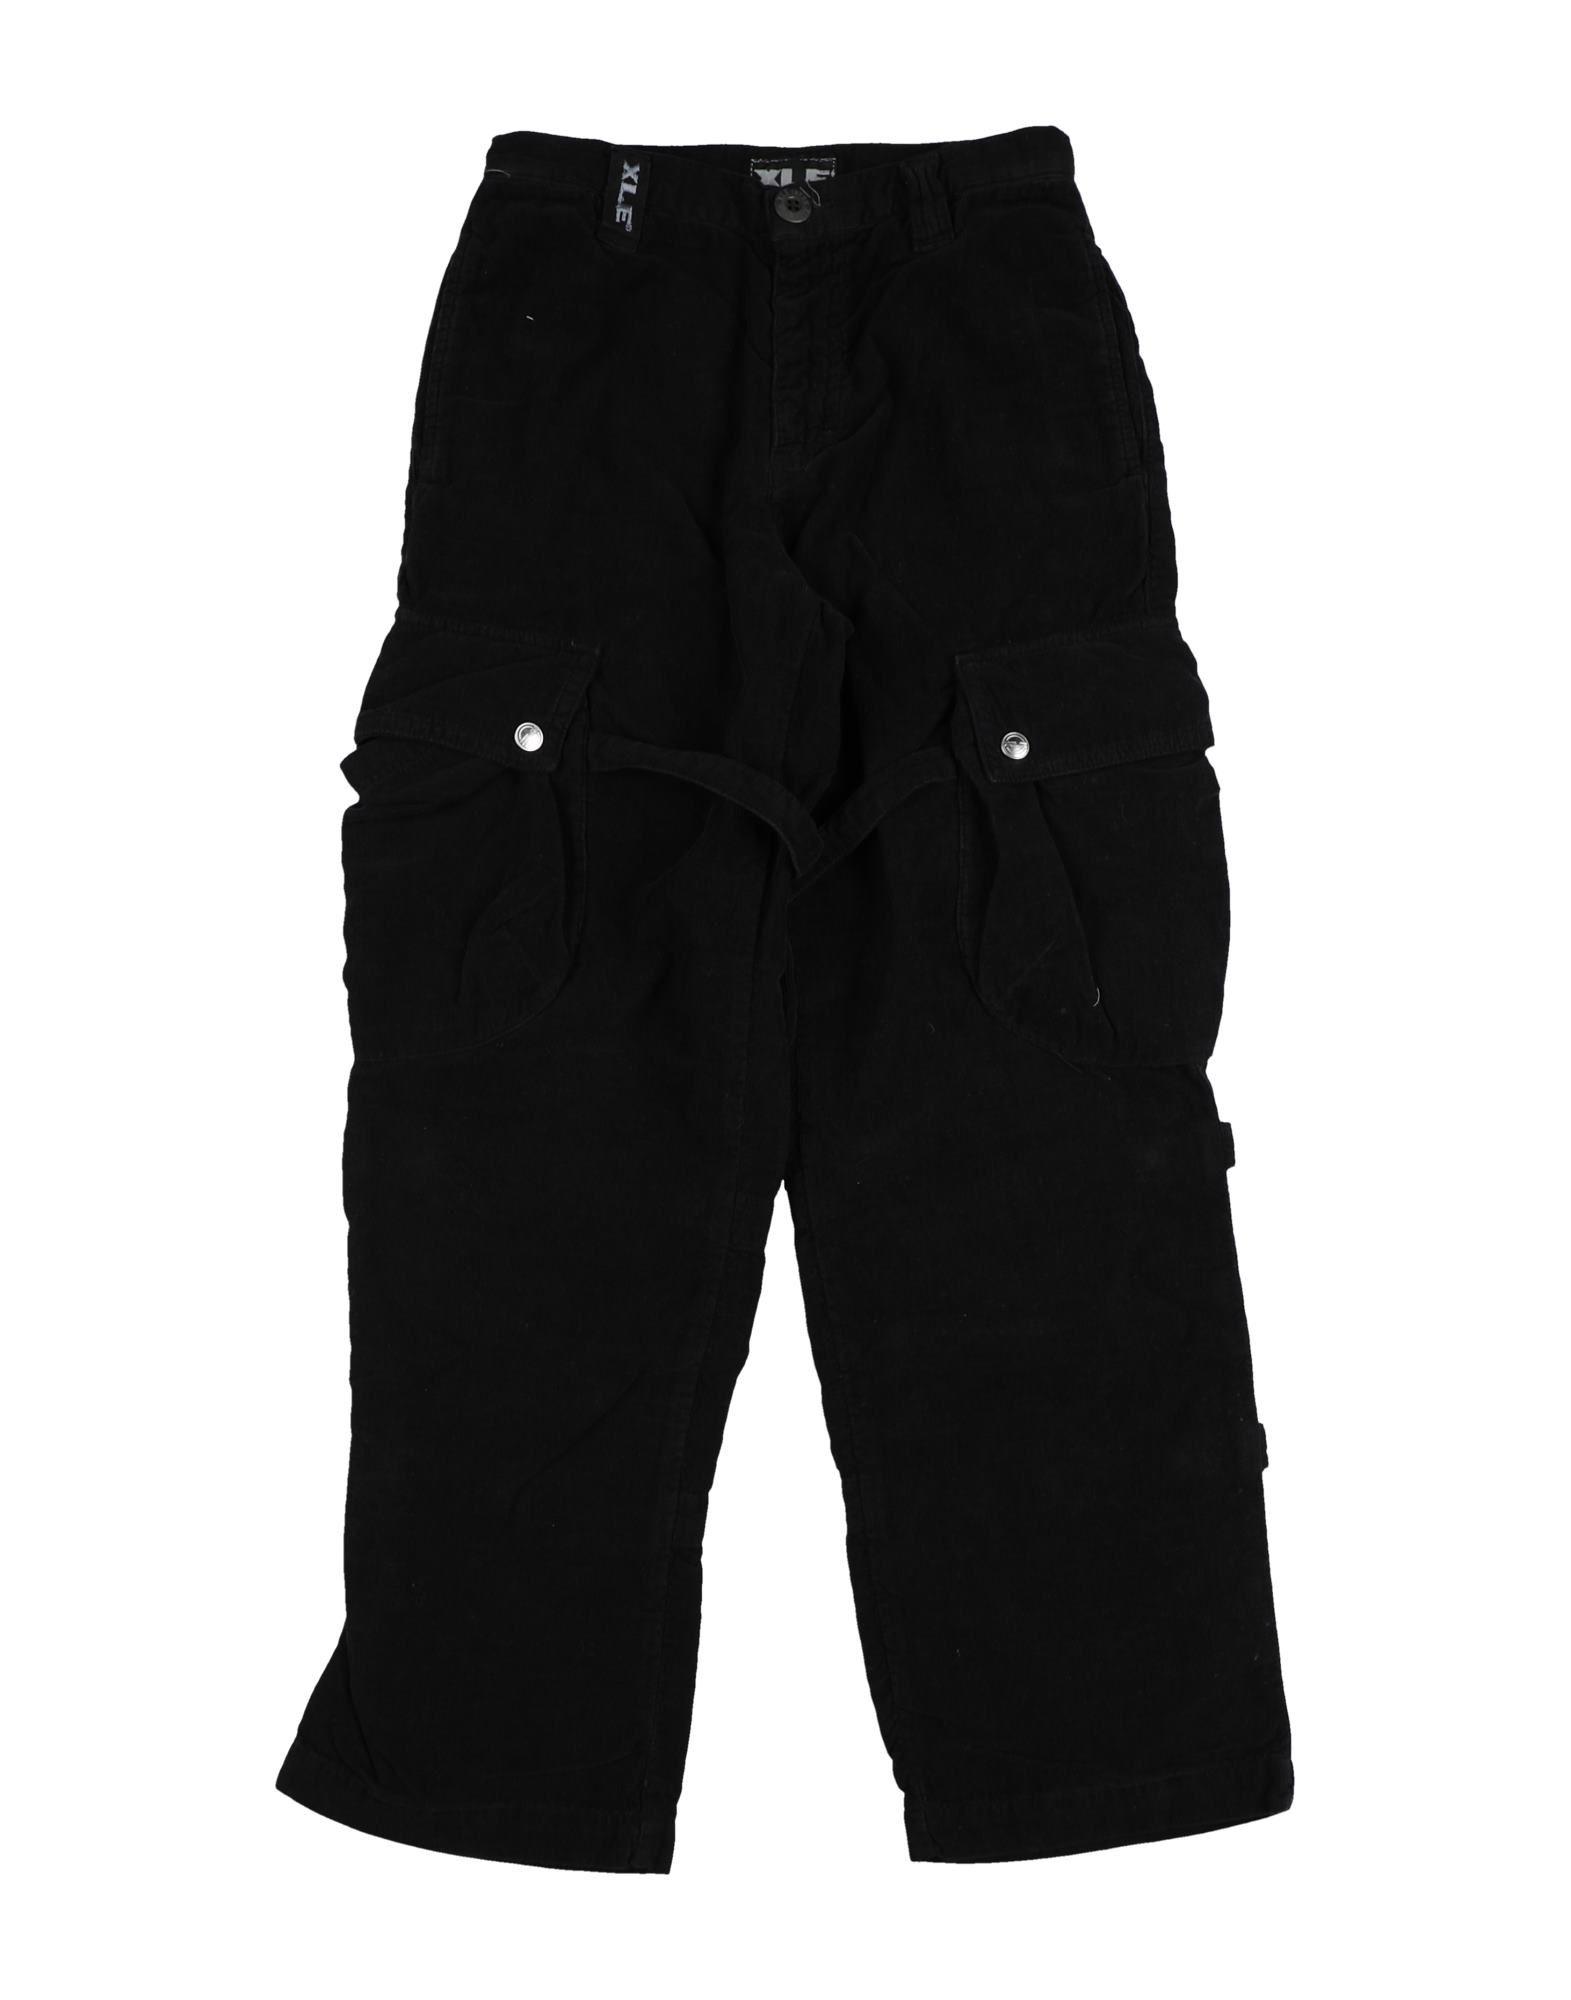 Xle International Company Kids' Casual Pants In Black